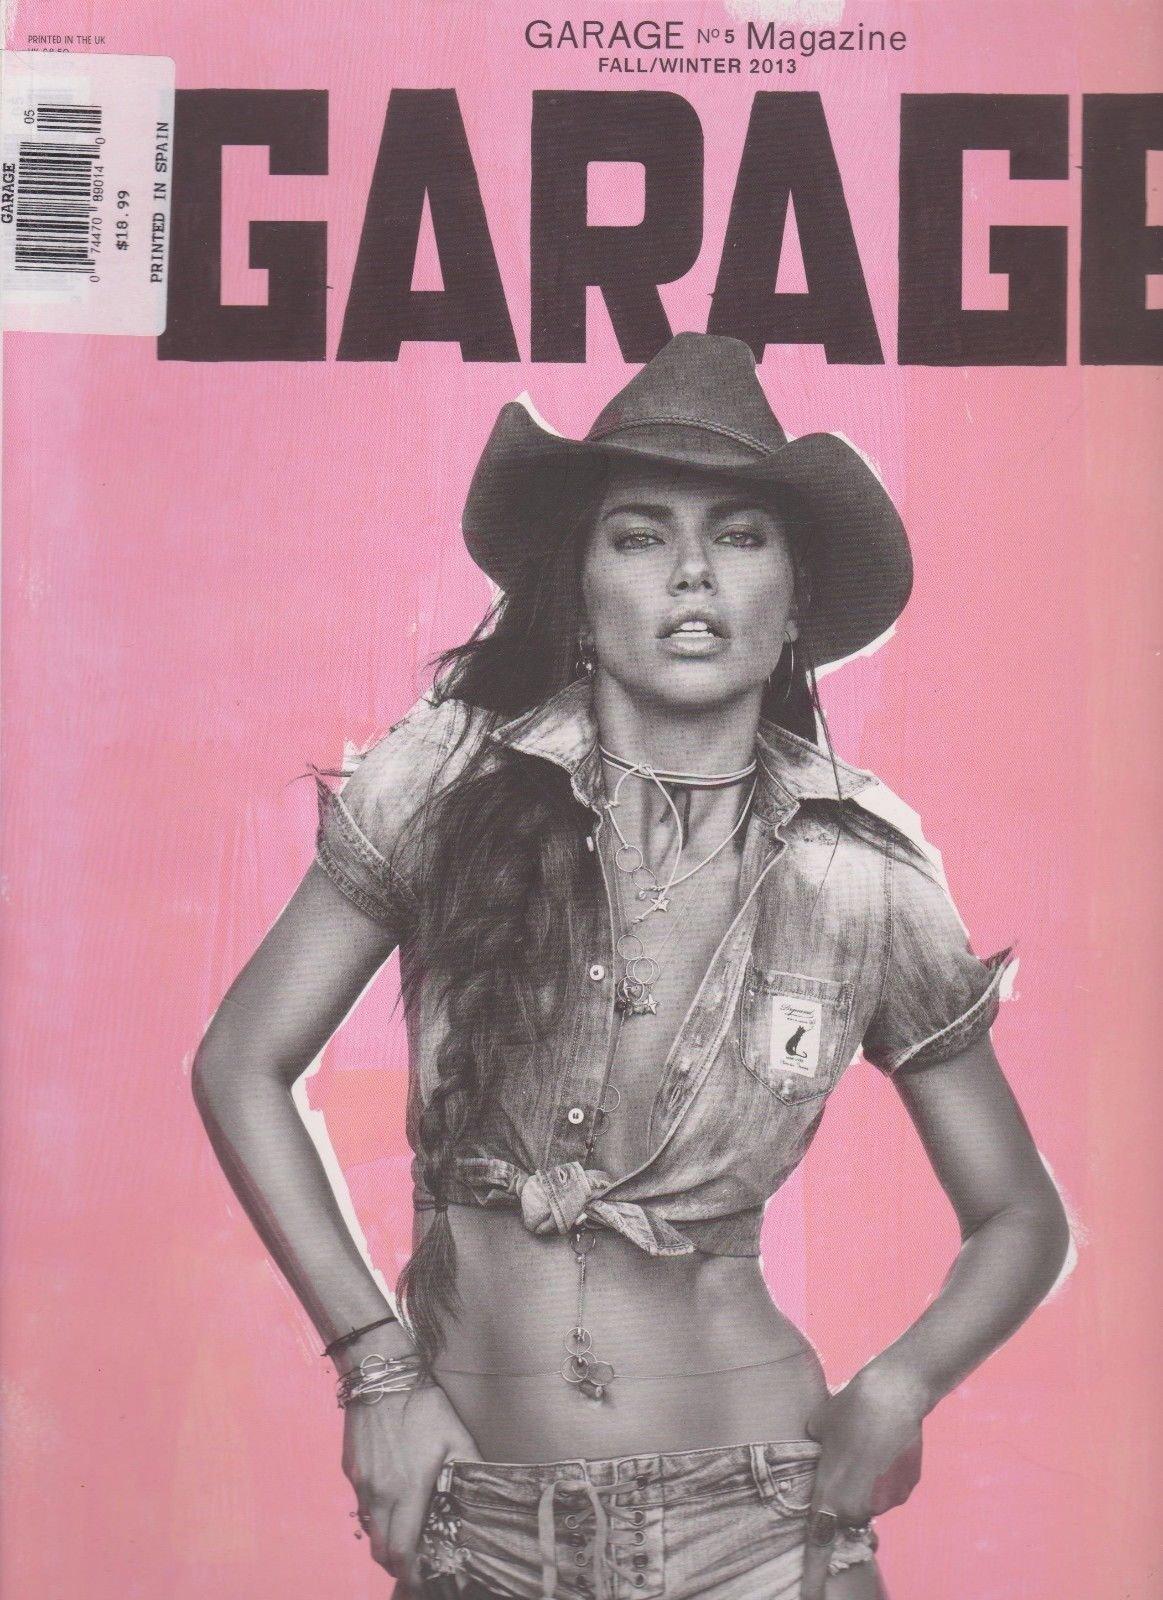 GARAGE MAGAZINE #5 FALL/WINTER 2013, Adriana Lima.